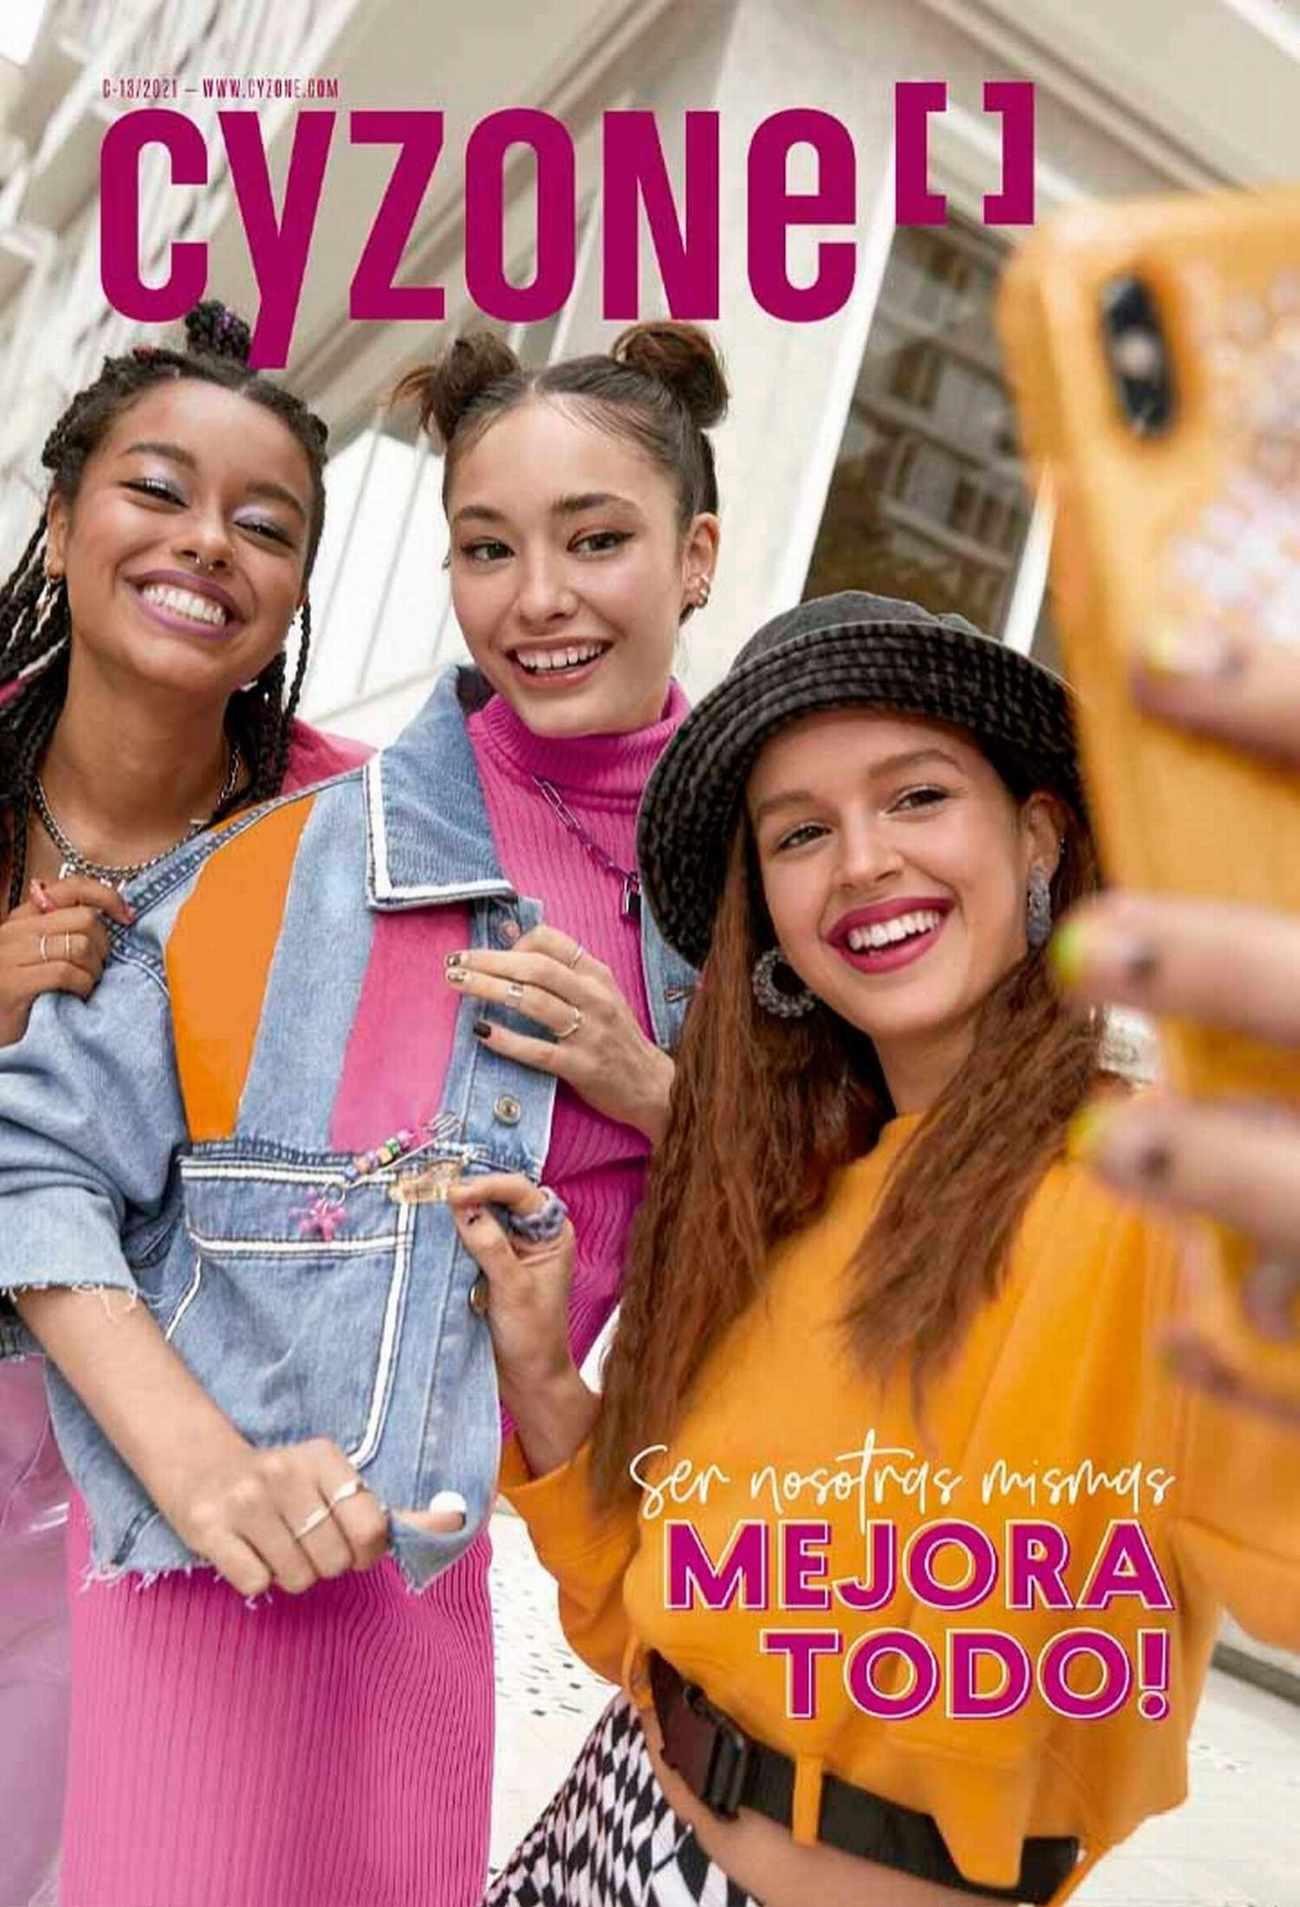 Catálogo Cyzone Campaña 13 2021 Perú